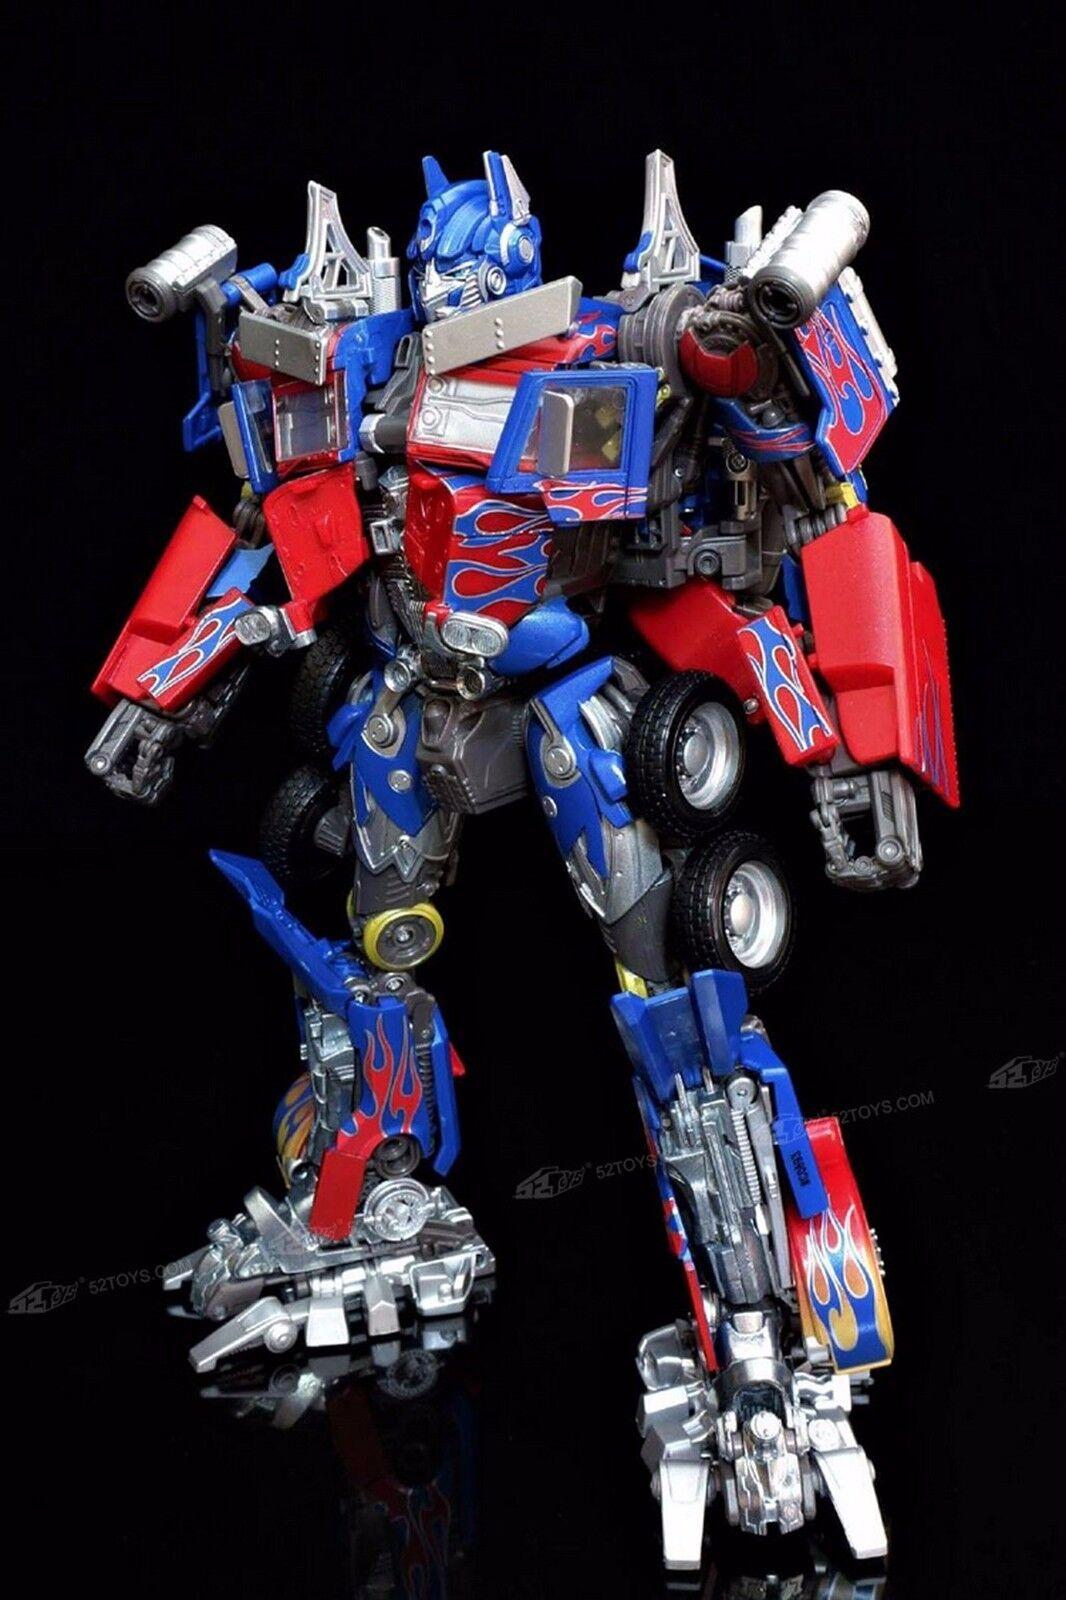 Regalo de figura de acción de transformadores obra maestra película serie Optimus Prime MPM04